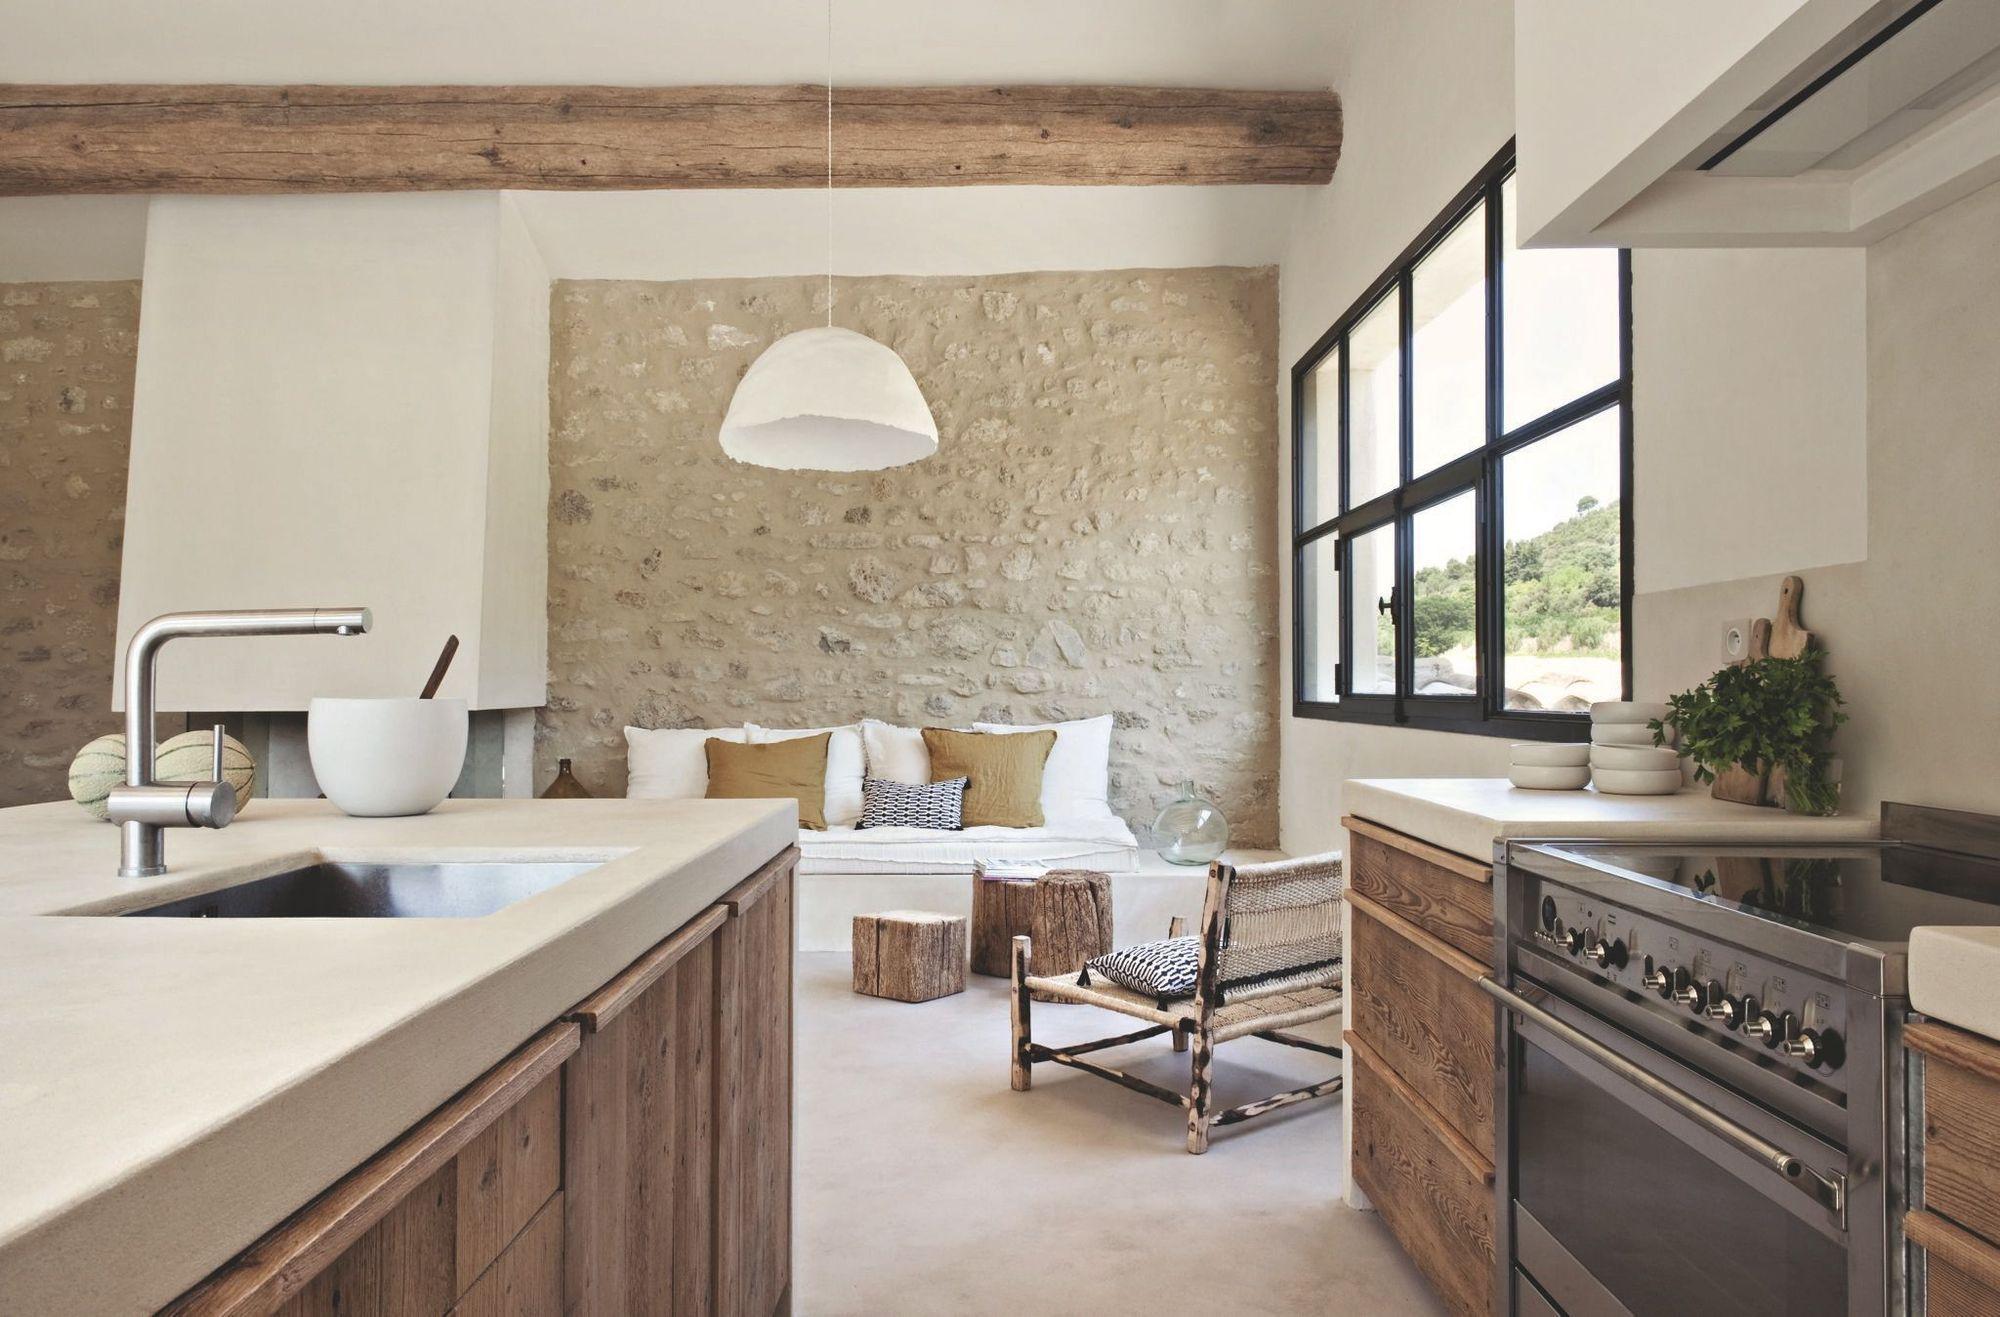 Renovation bastide en provence ml hdesign k che neu pinterest - Farbkonzept wohnzimmer ...